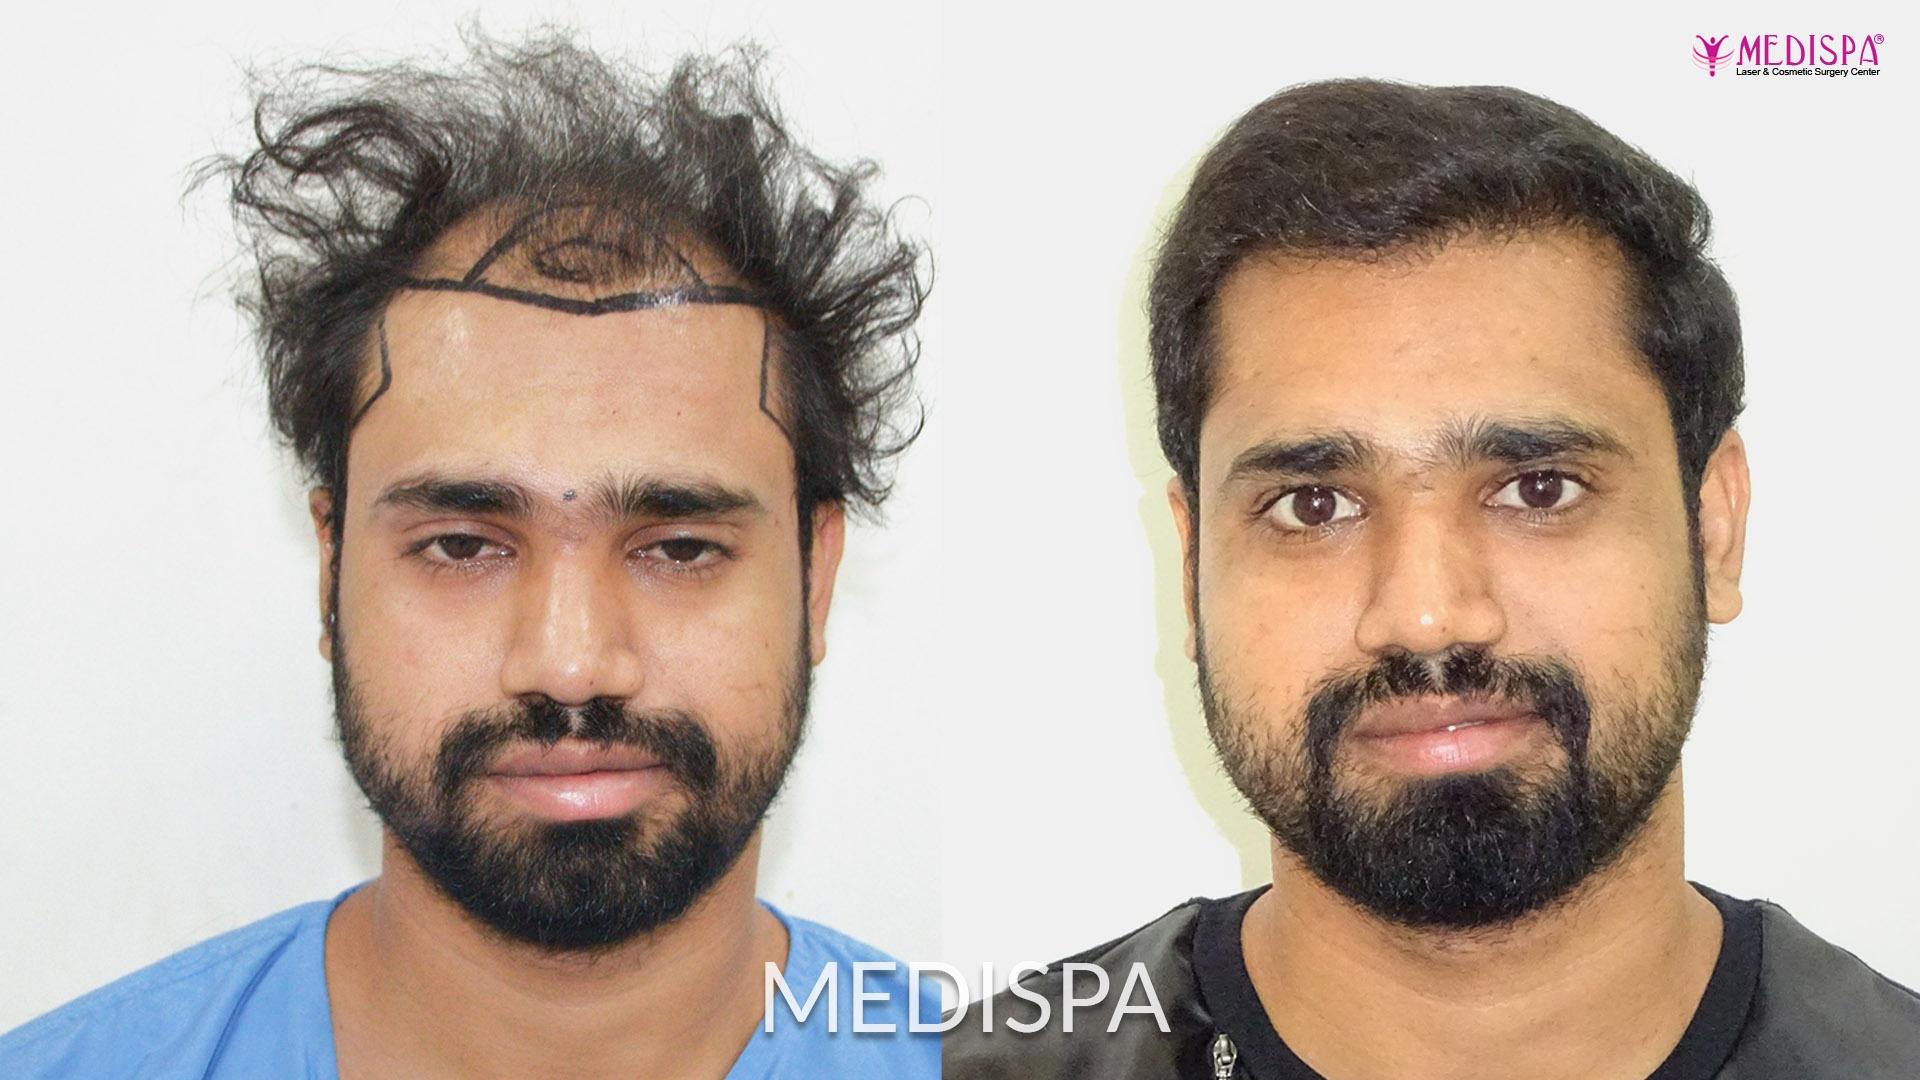 Facial hair growth retardation